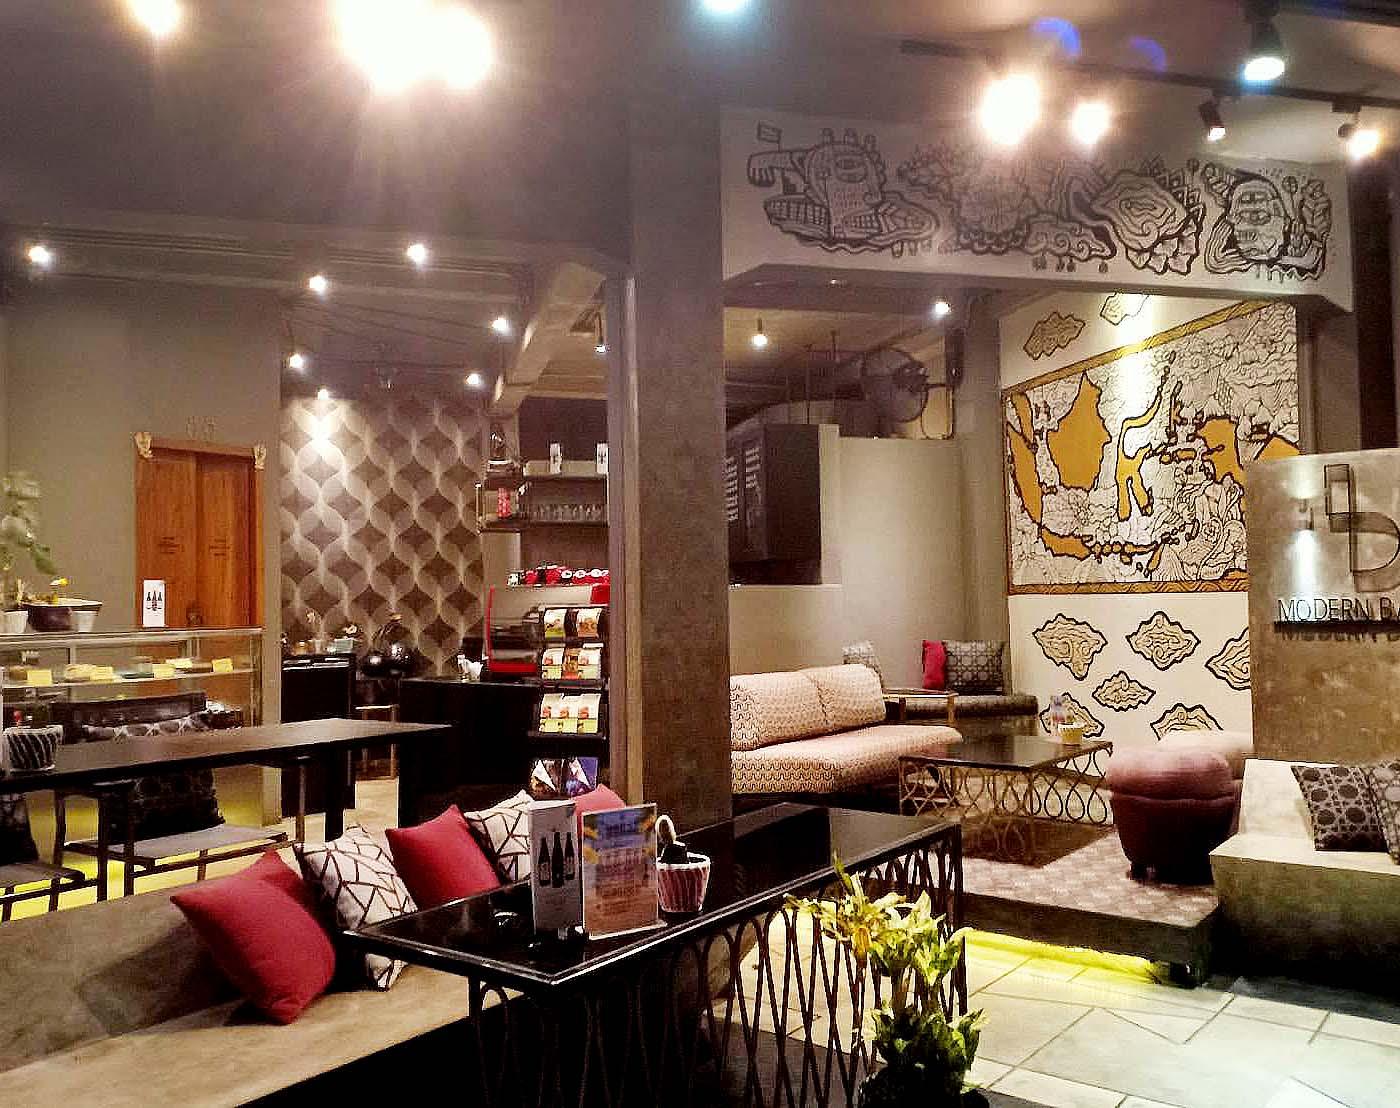 Modern Balinese Cafe bsideの画像1